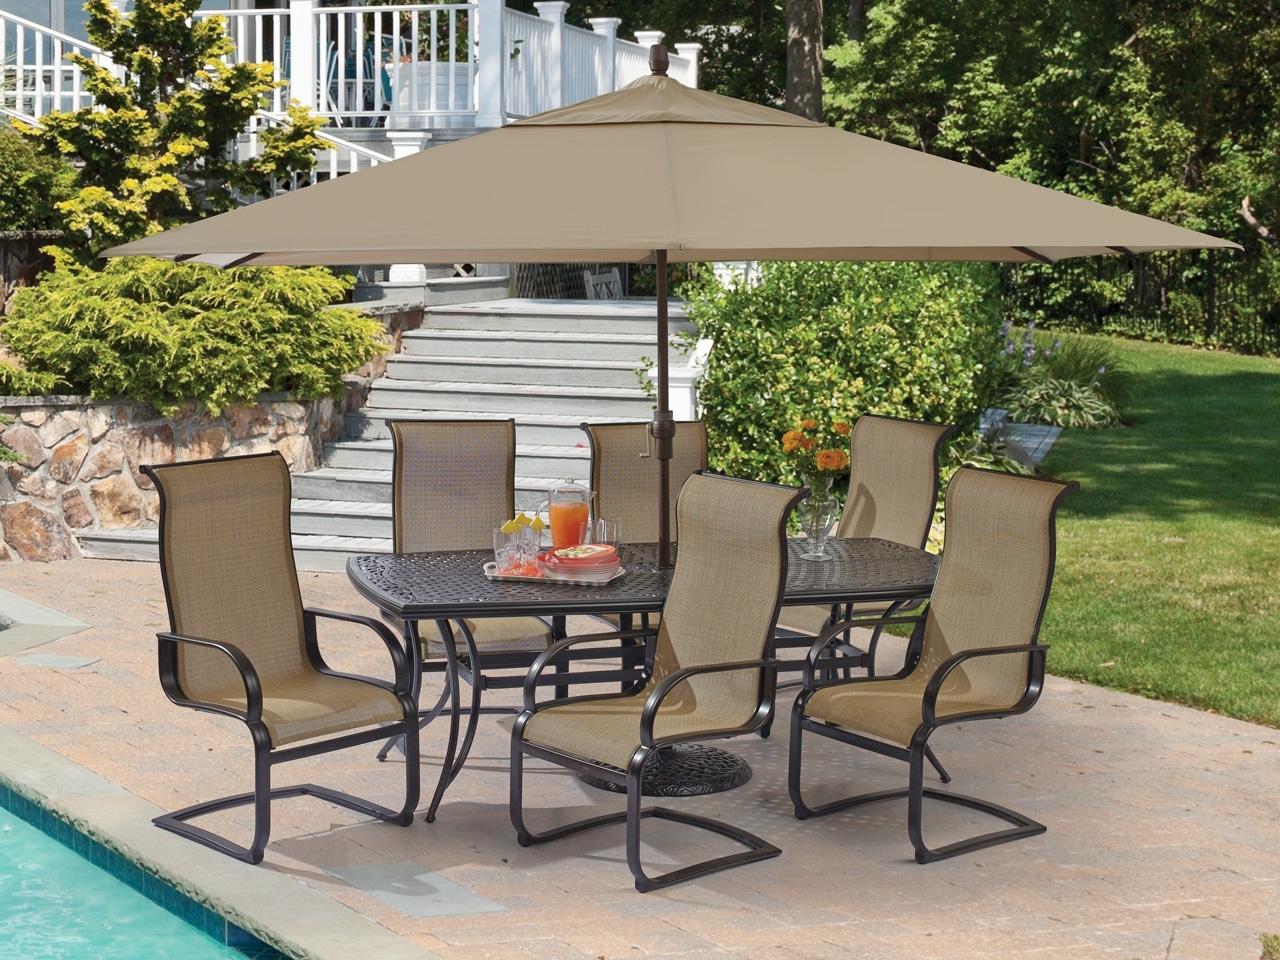 Big Lots Patio Umbrellas For Popular 8 Piece Patio Dining Set Furniture Walmart Lowes Big Lots Outdoor (View 5 of 20)